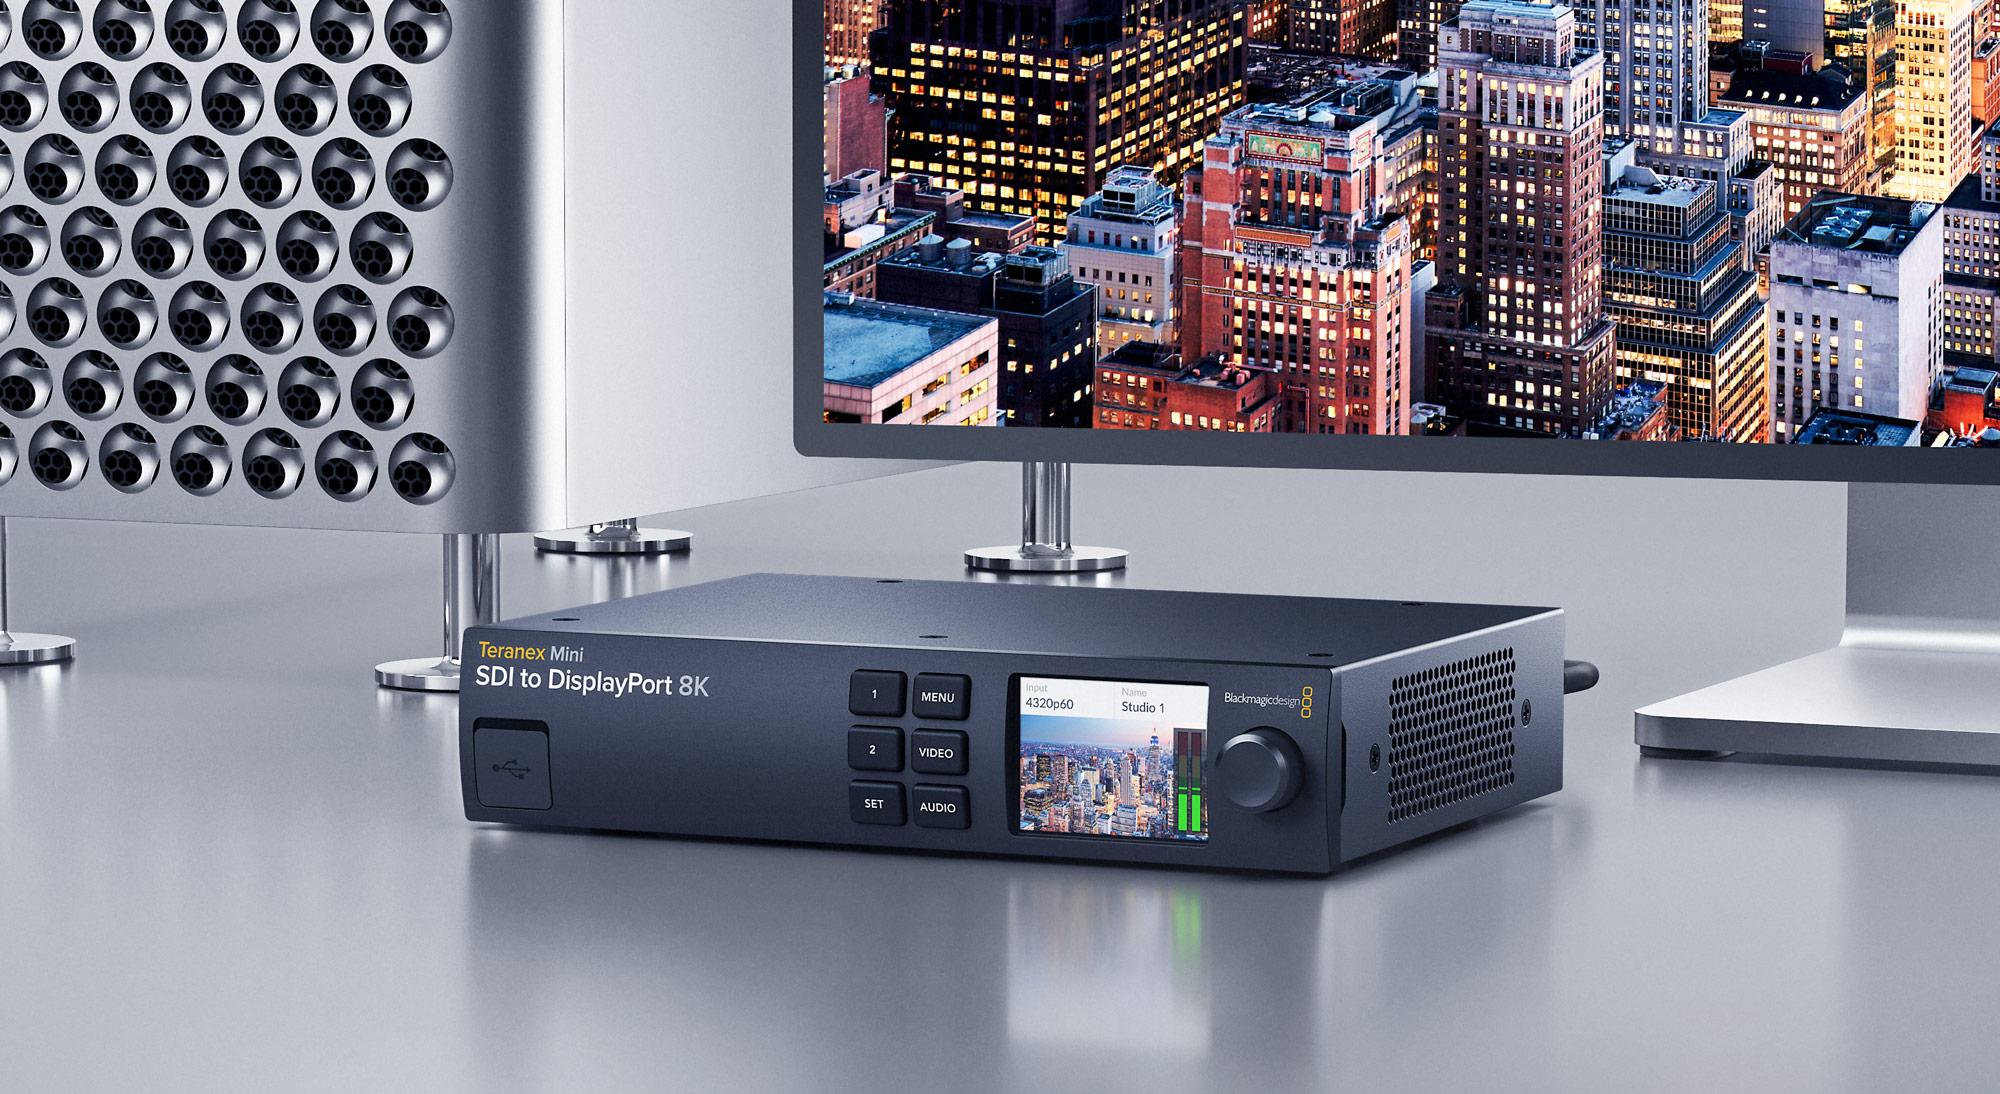 Blackmagic Design Announces Teranex Mini Sdi To Displayport 8k Hdr Now Shipping Broadcasting Cable